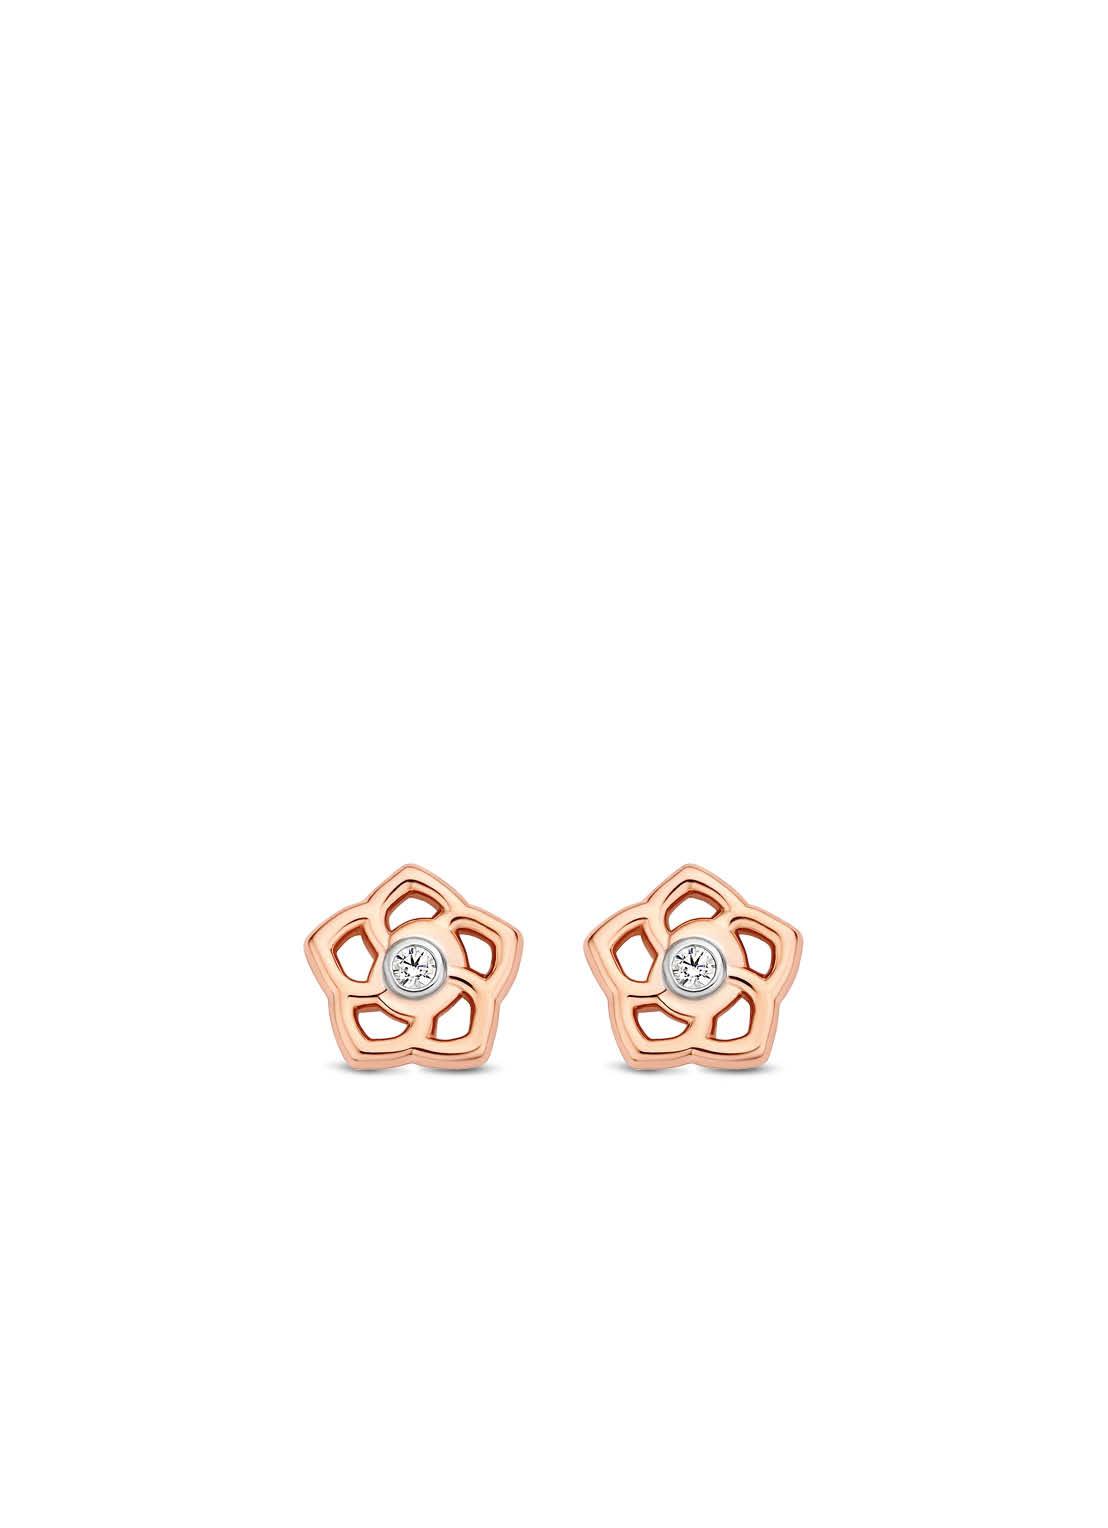 TI SENTO - Milano Earrings 7809ZR-2